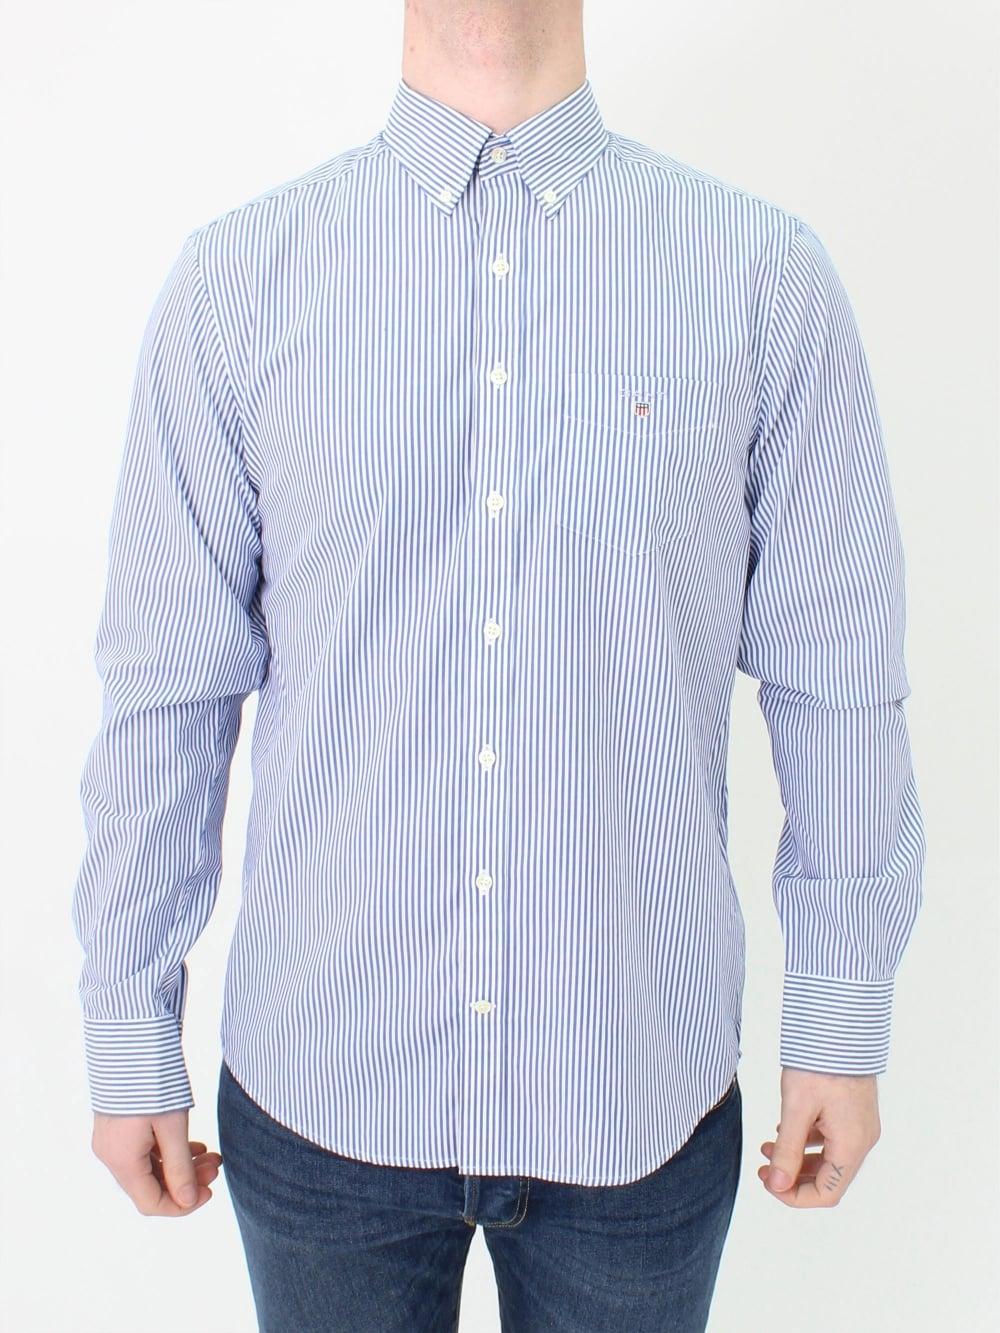 3bb2c970e5 ... striped shirt men gant usa; gant the broadcloth banker shirt in yale  blue northern threads ...